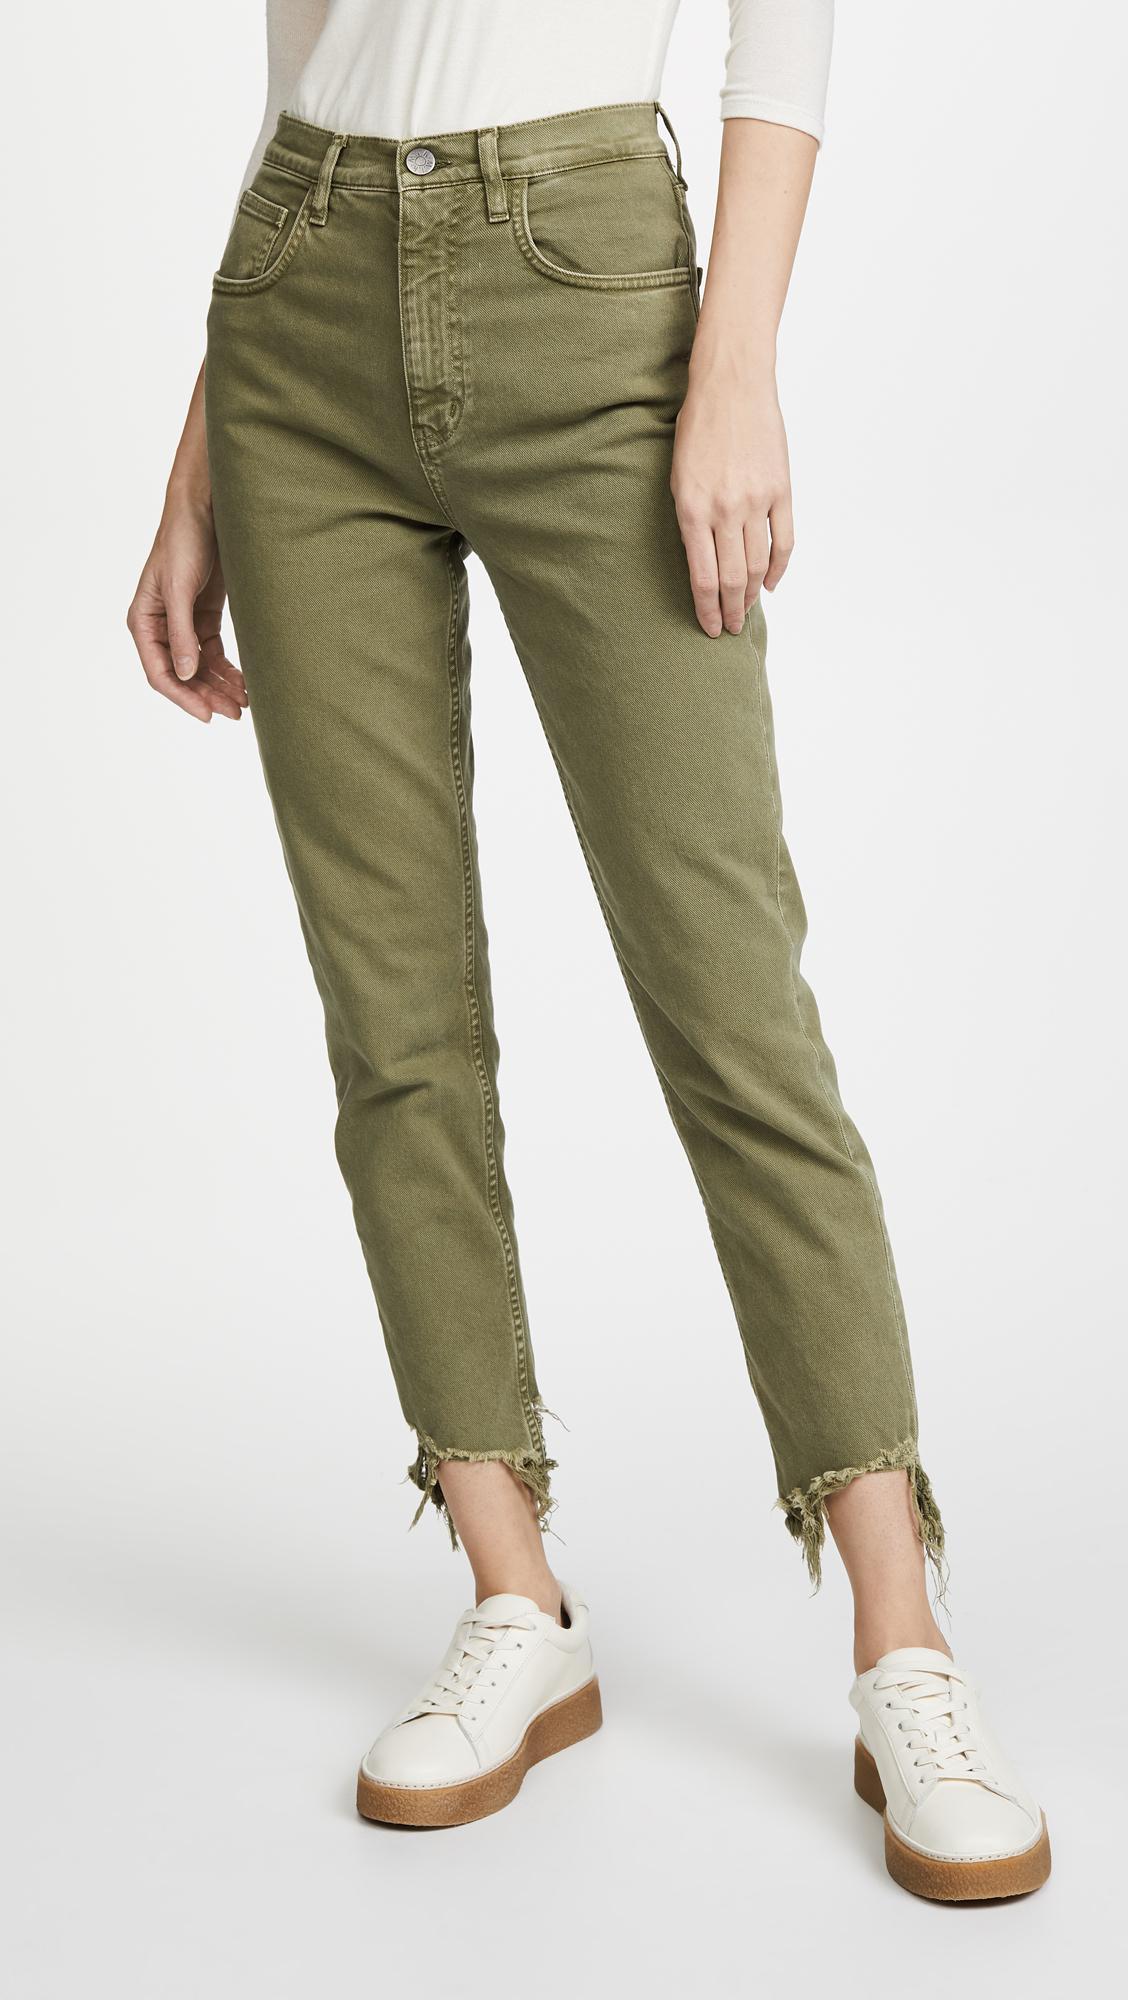 Jean Mih Mimi Haute Jean Mince Vintage Avec Ourlet Montée Cru - Jeans Mih Vert Nova nyGagrvMKK